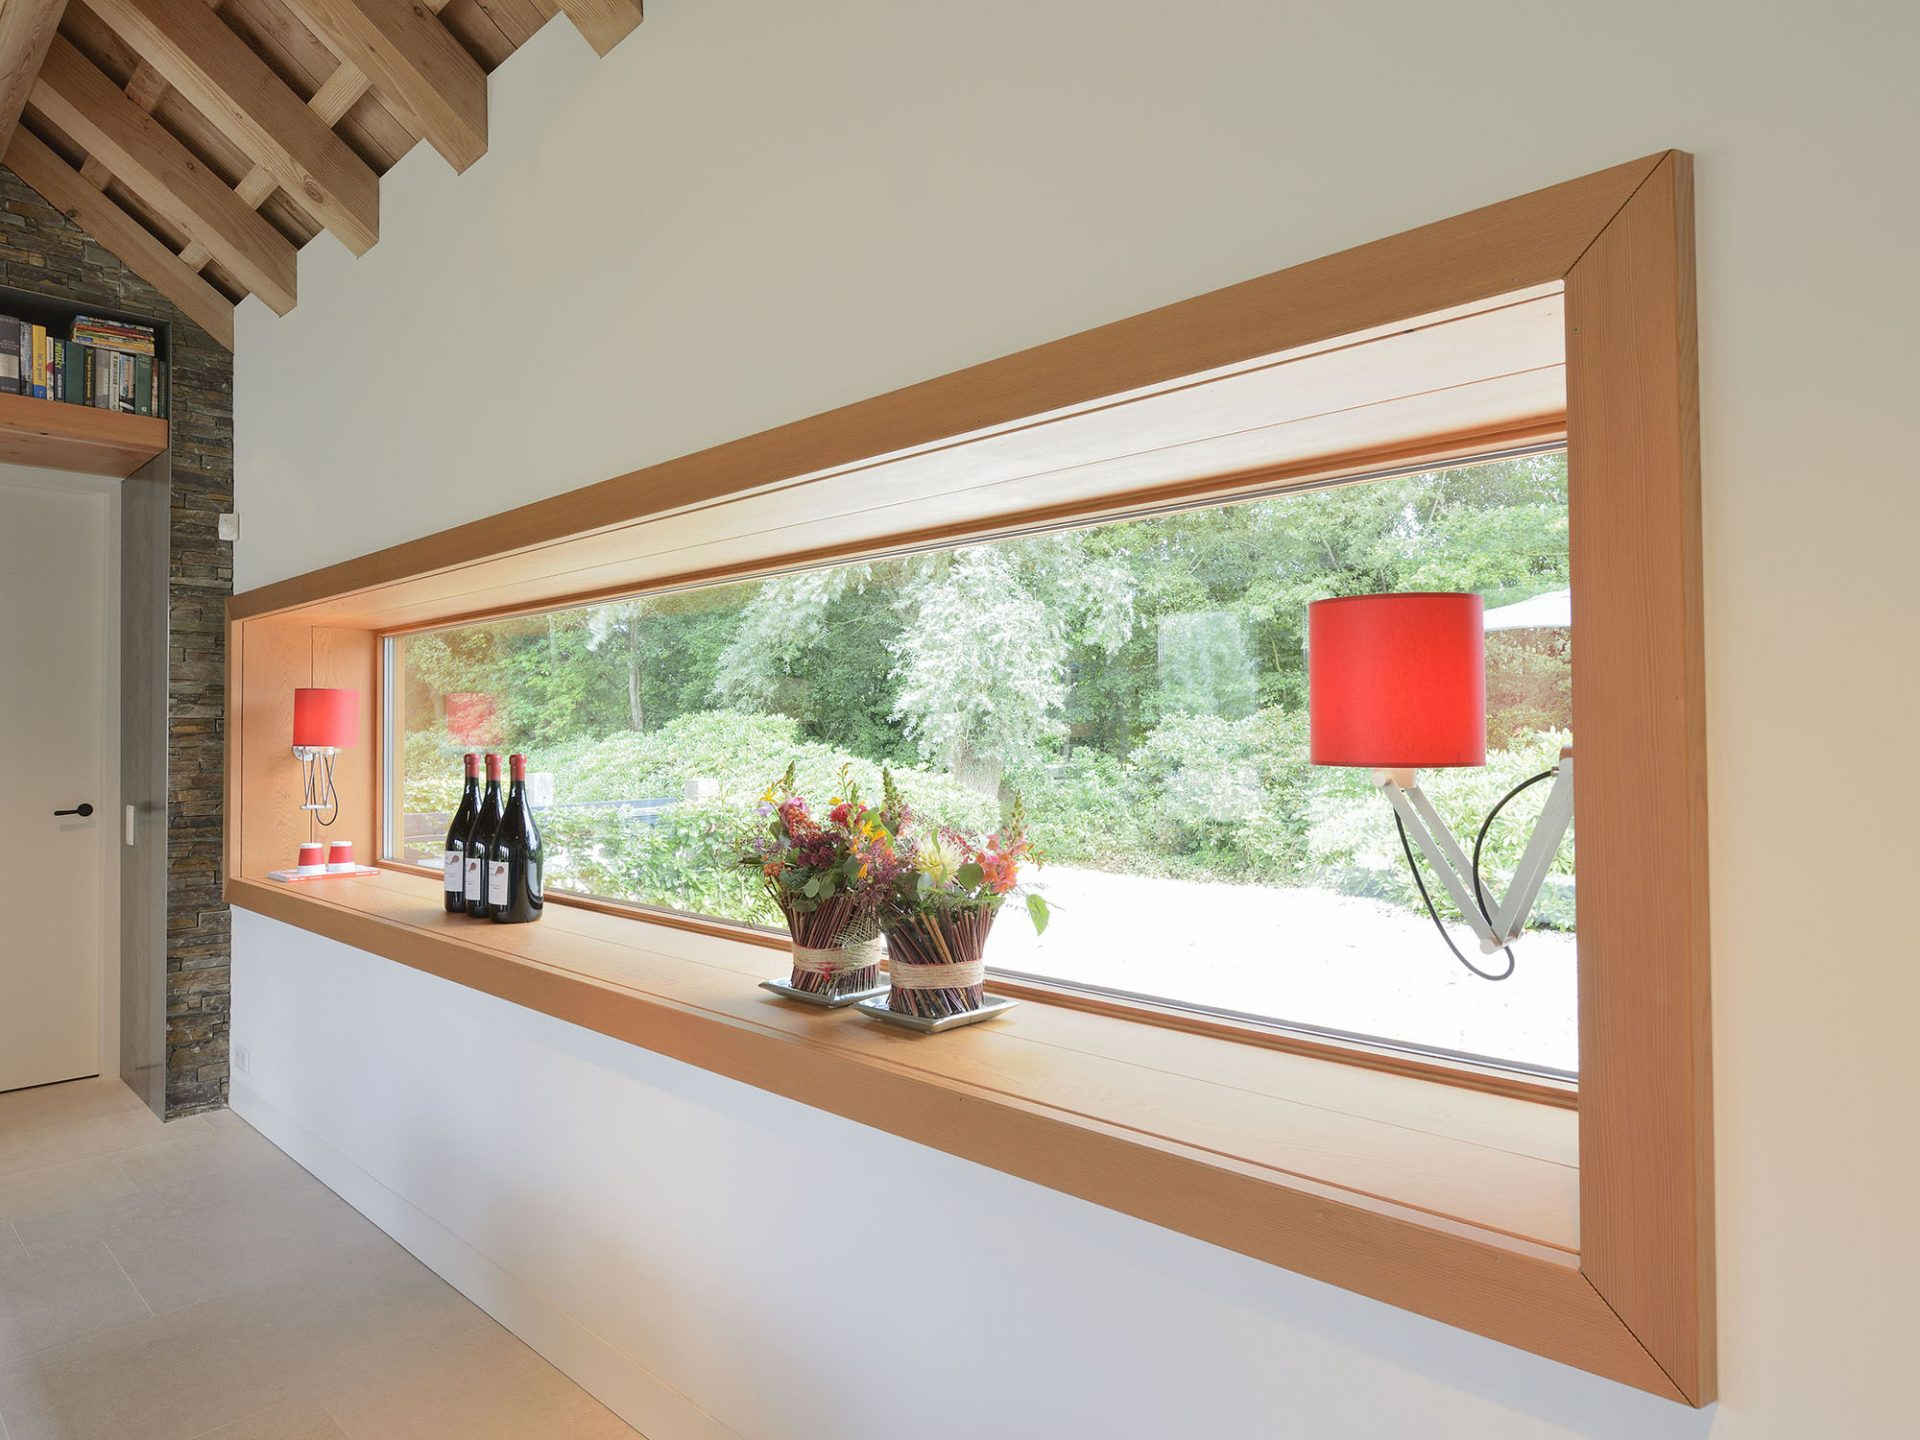 Kembra modern keukenontwerp best kitchen design images in modern